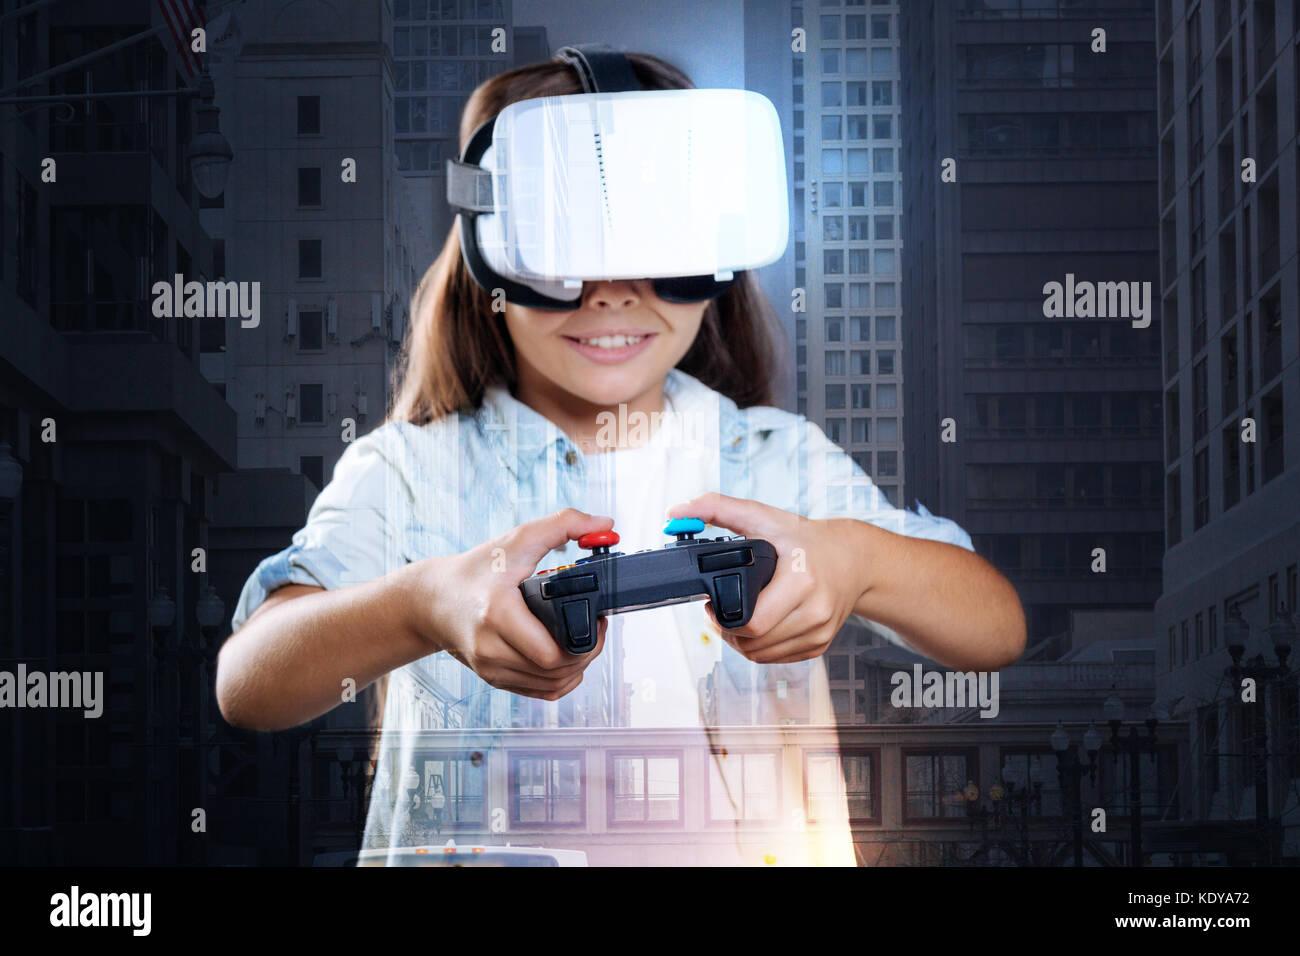 Smiling girl enjoying VR game with controller - Stock Image